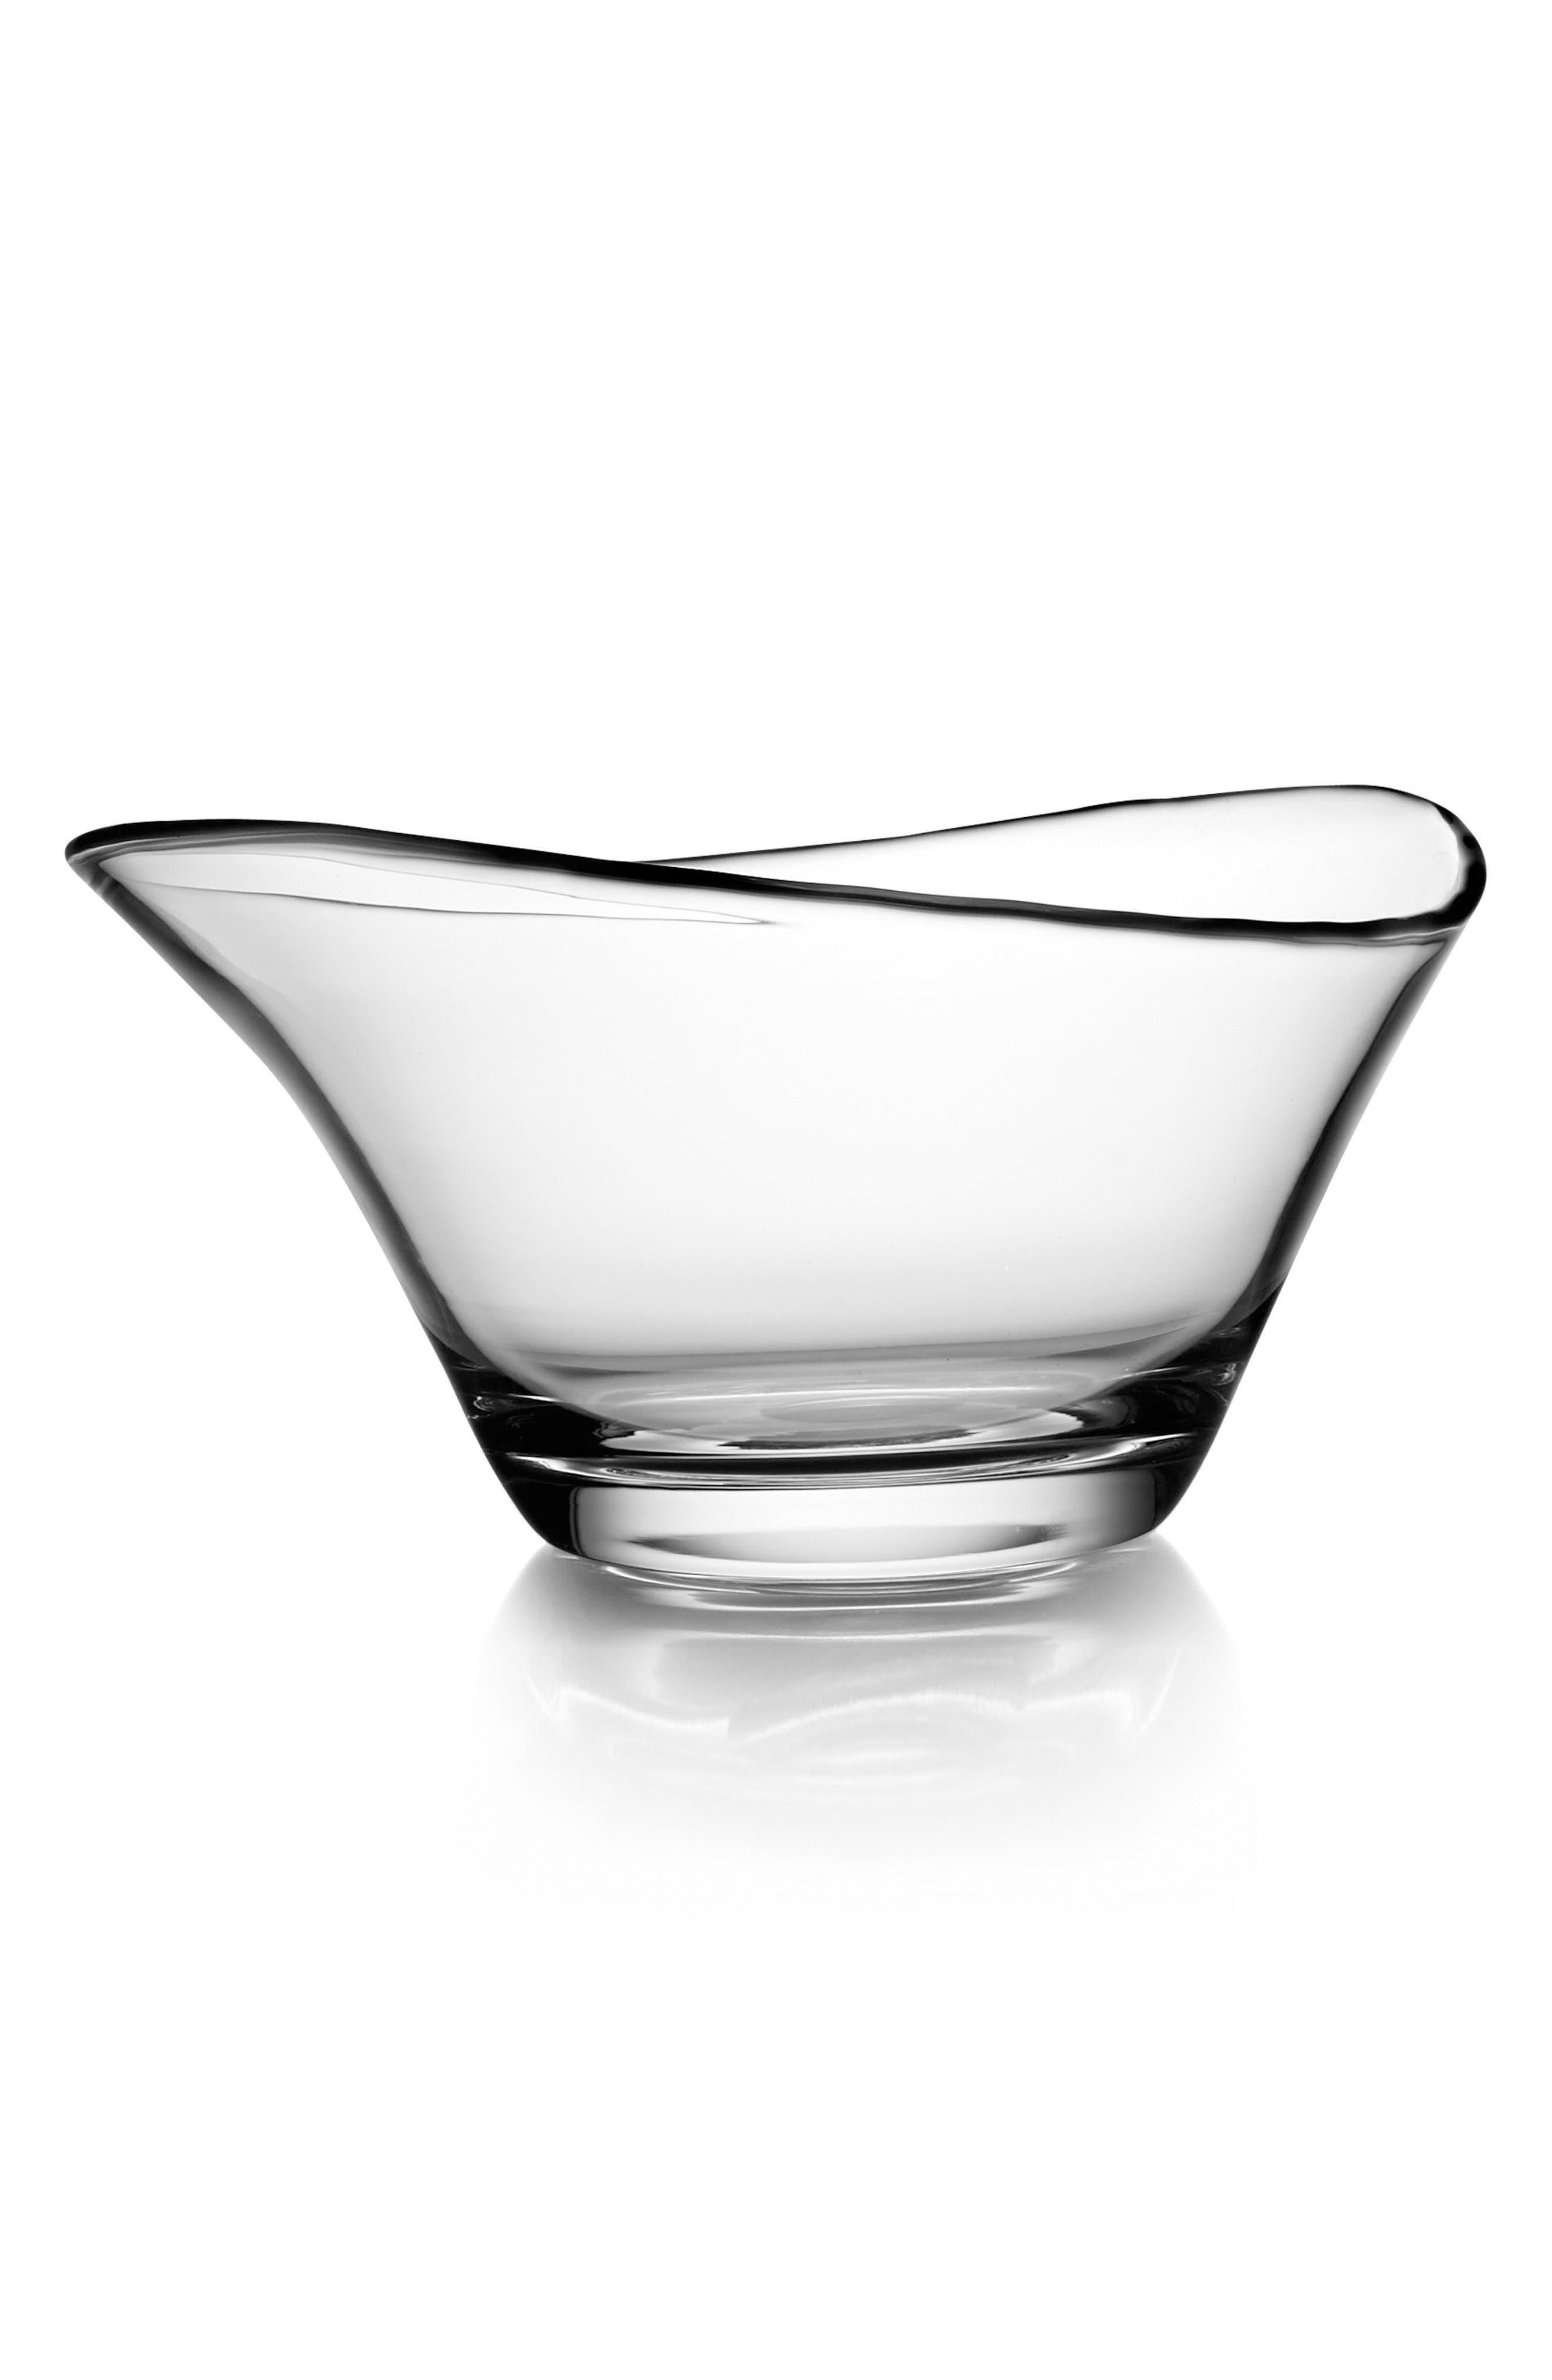 Large Moderne Bowl,                         Main,                         color, Clear